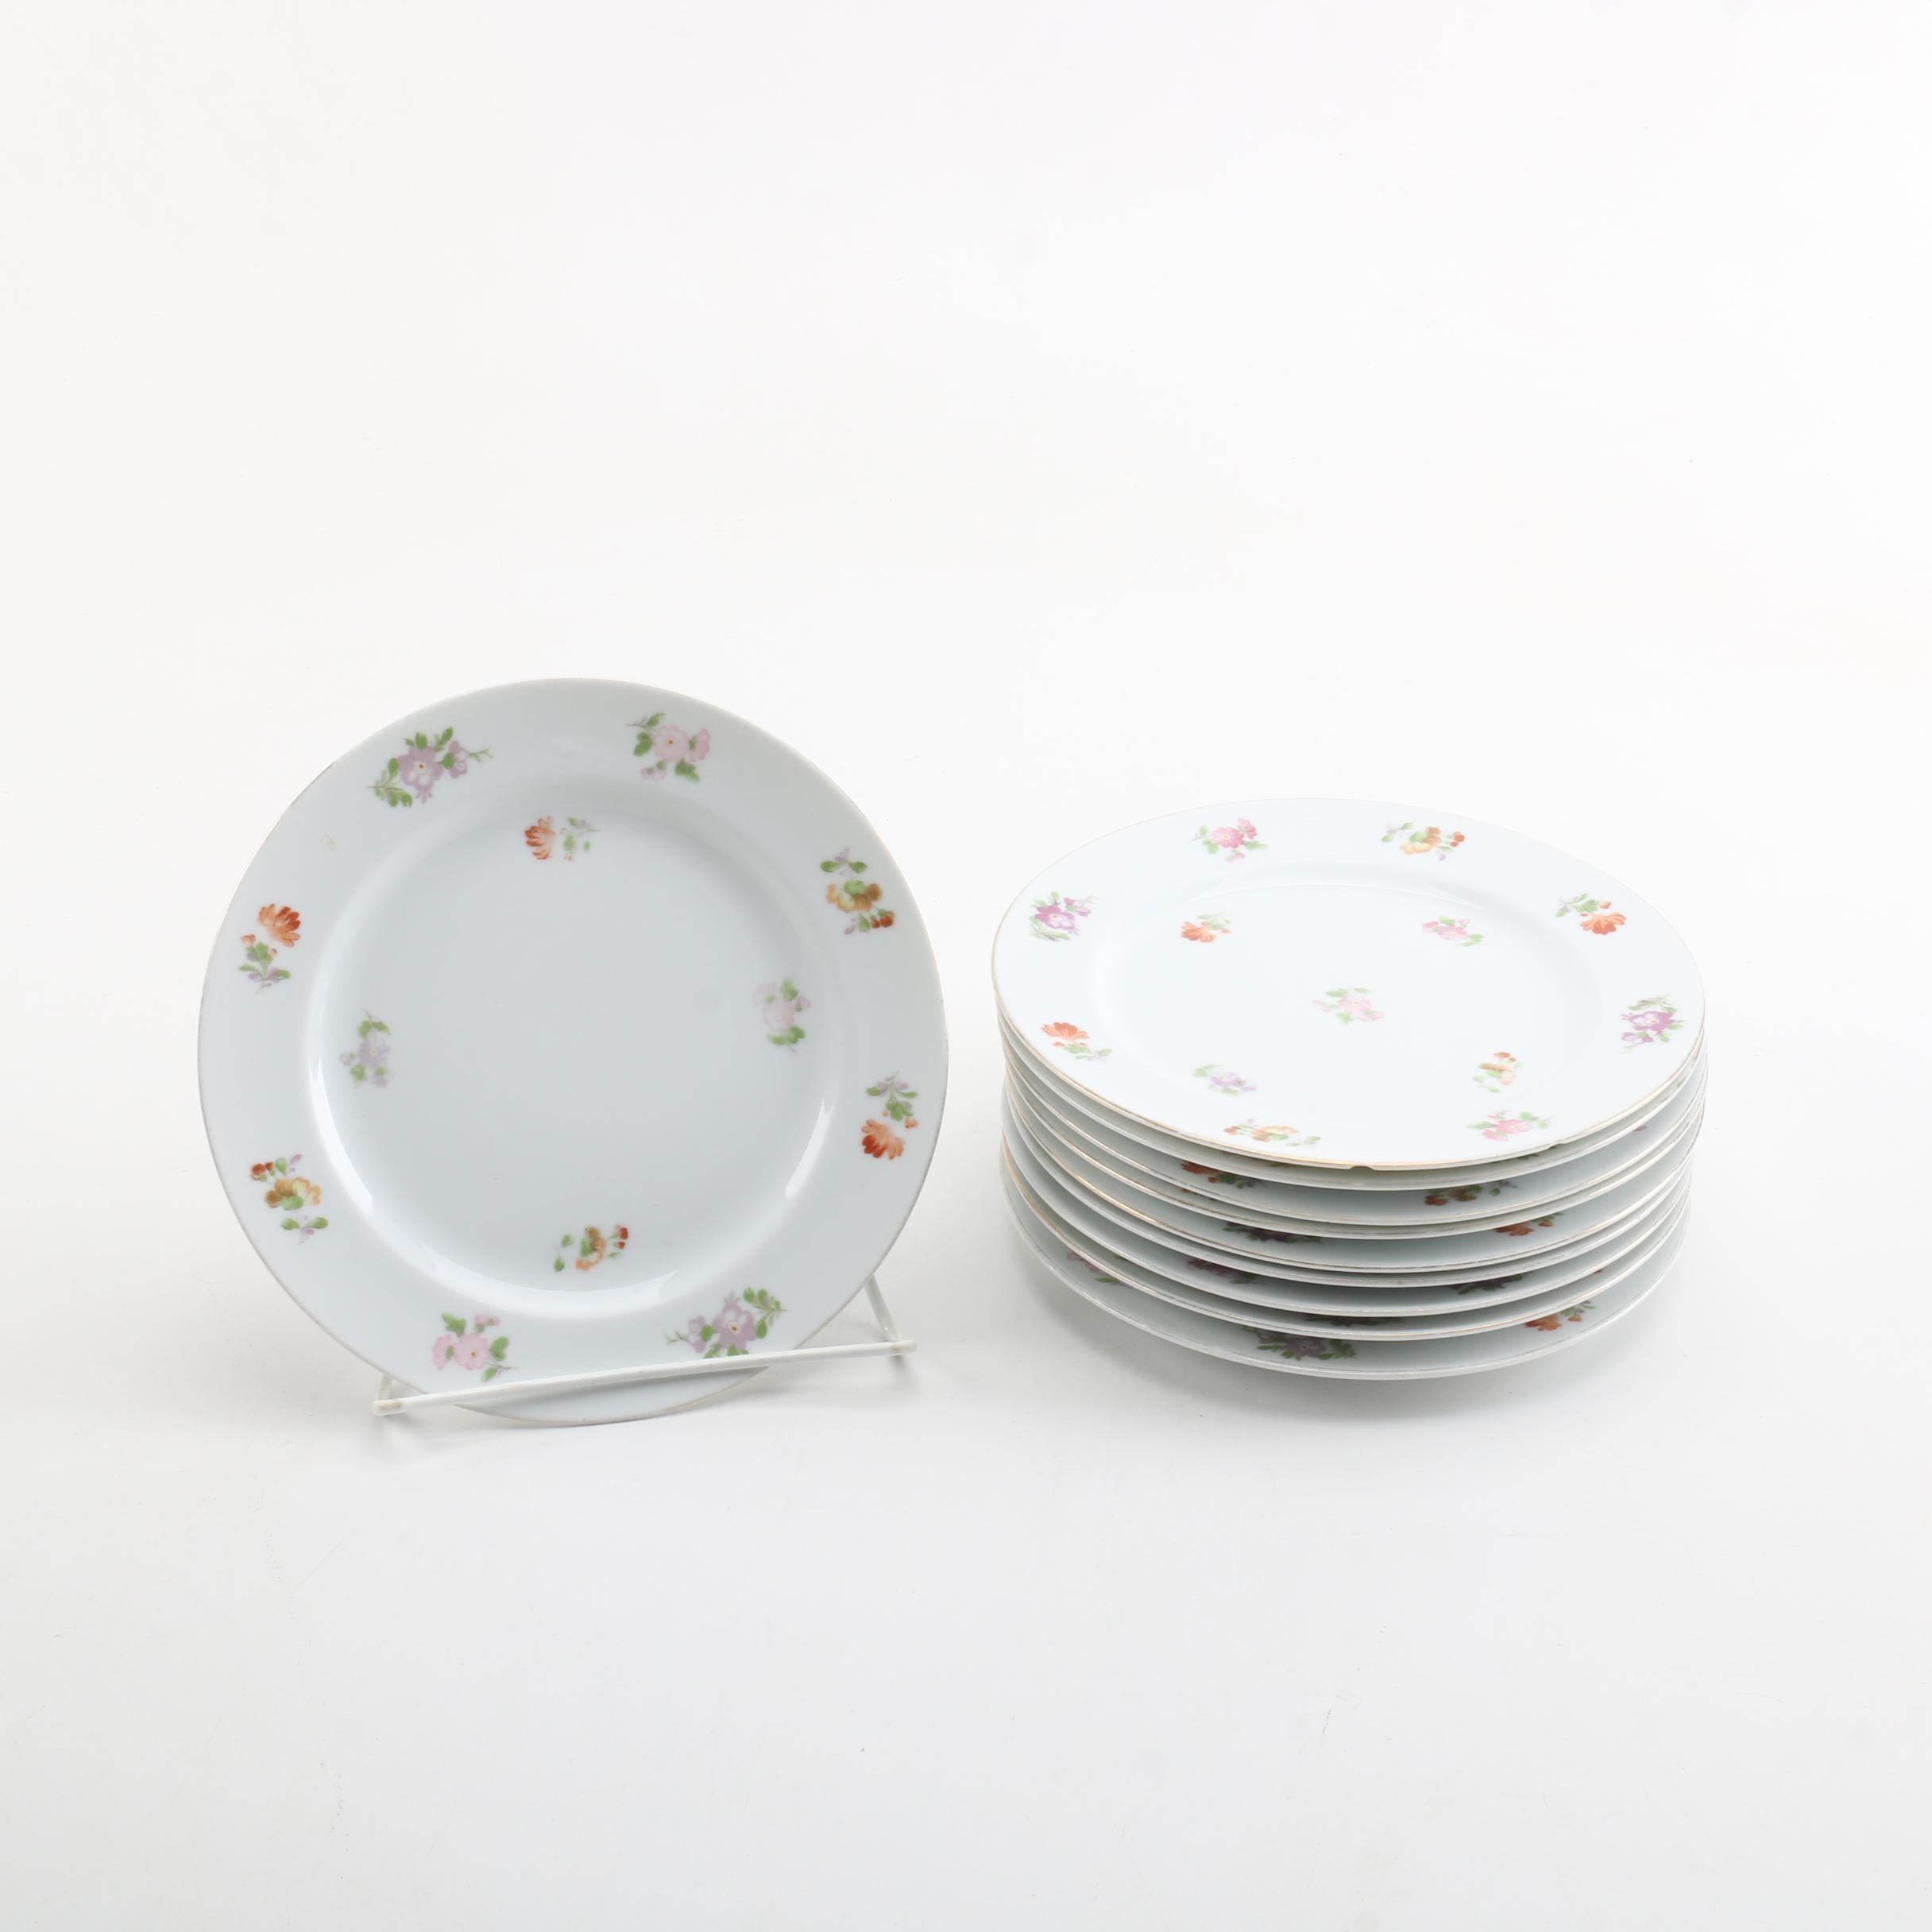 Vintage Noritake Porcelain Plates